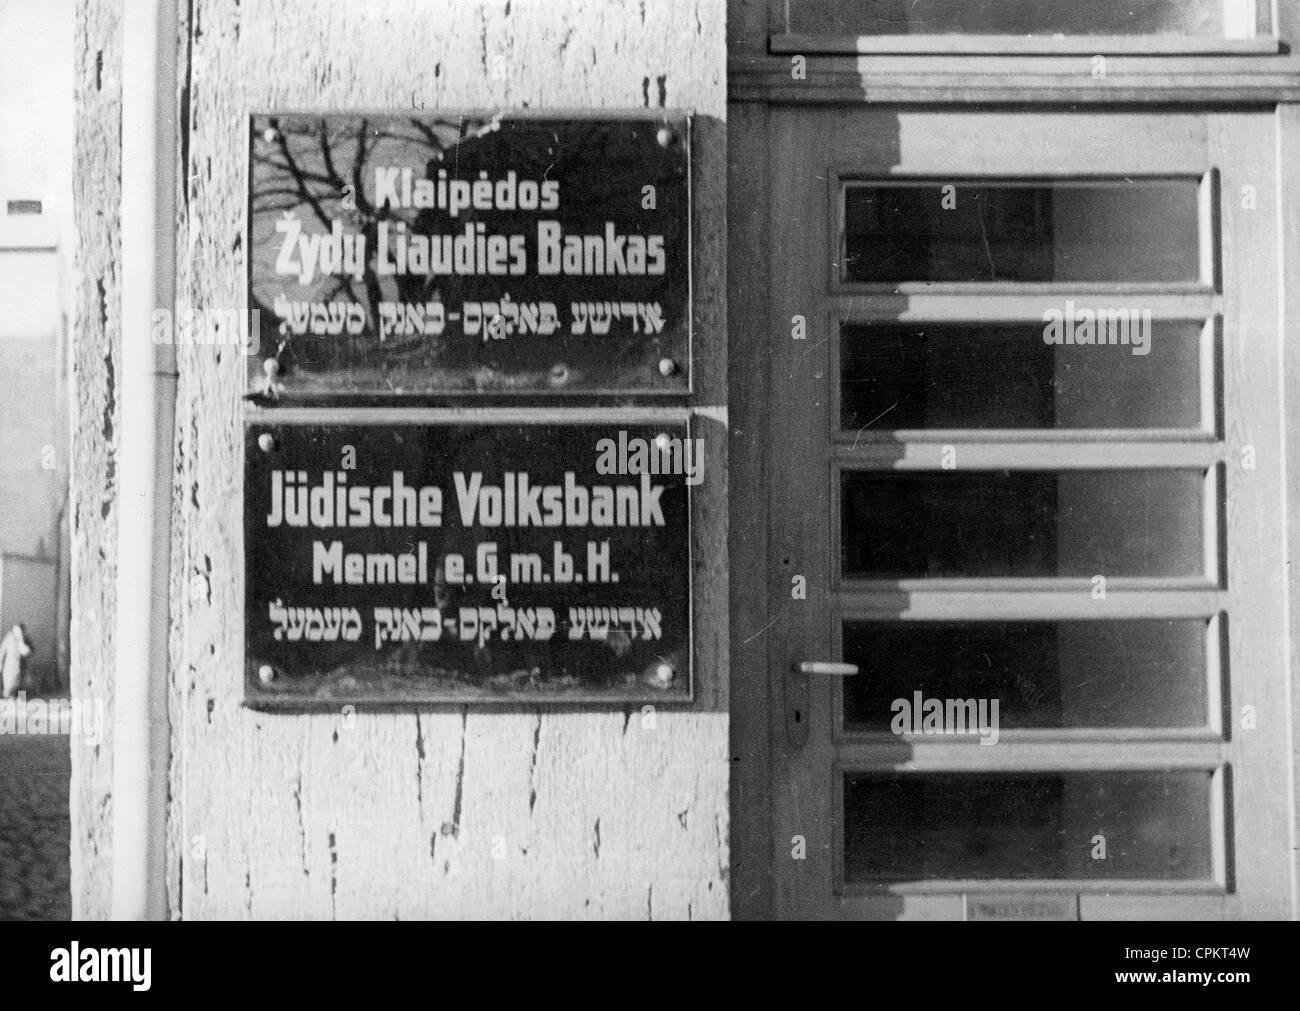 Entrance to the 'Jewish People's Bank Memel e.G.m.b.H' - Stock Image